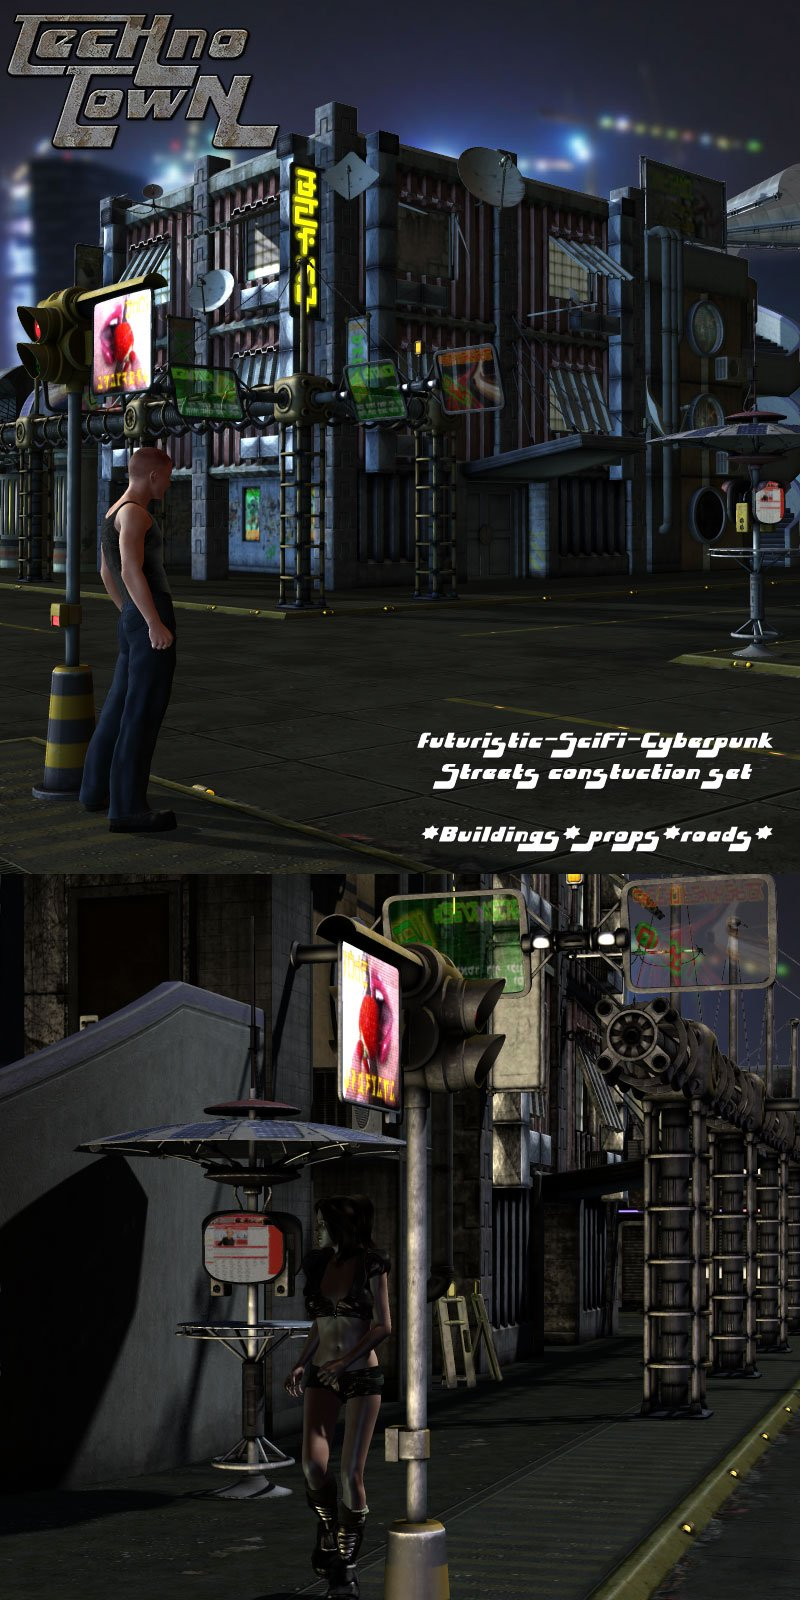 Techno Town Construction Set Vol 1